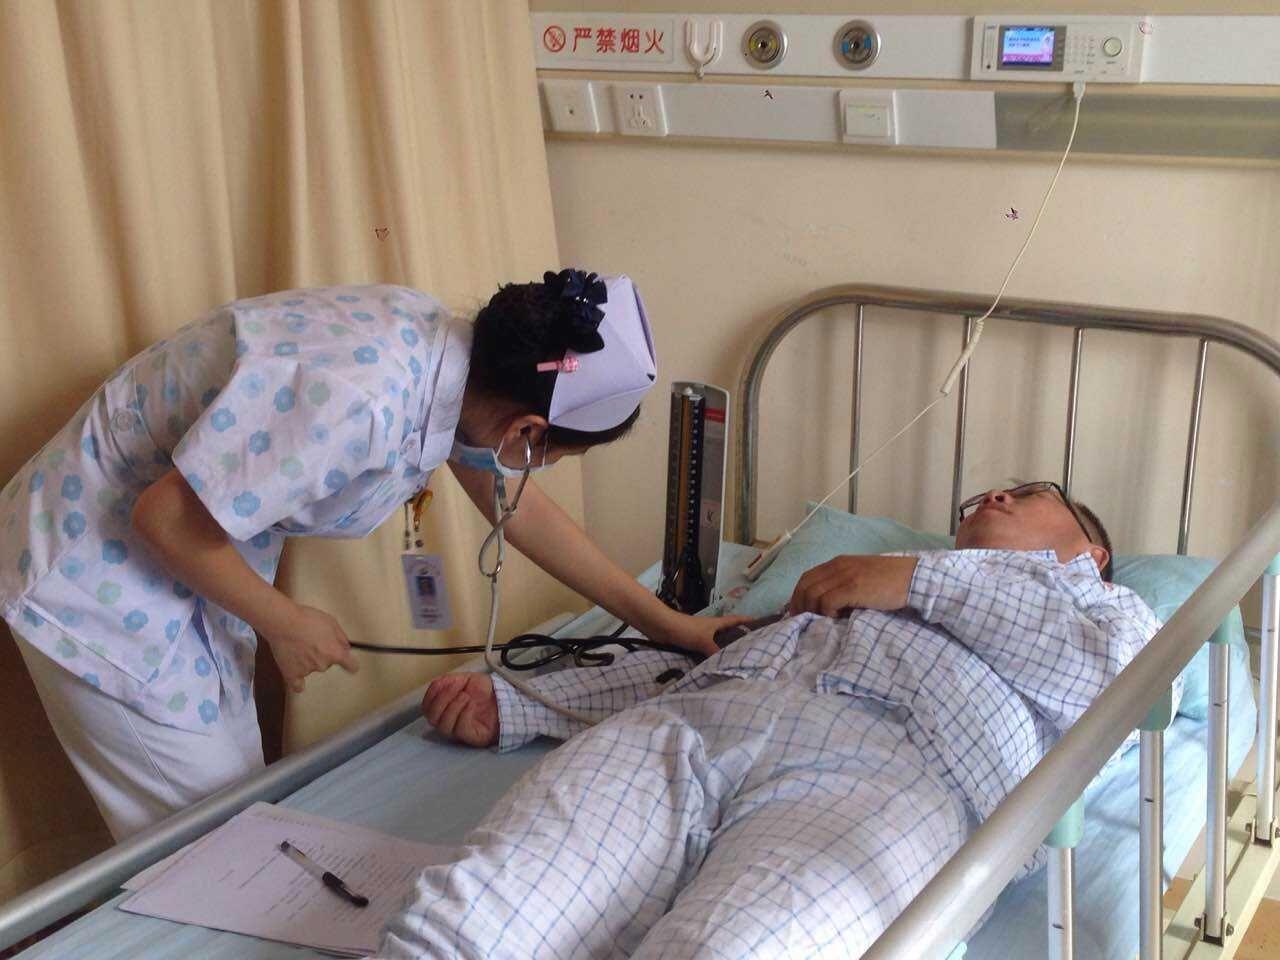 <b>海南日报受伤记者抵海口被送入海医附院接受治疗</b>